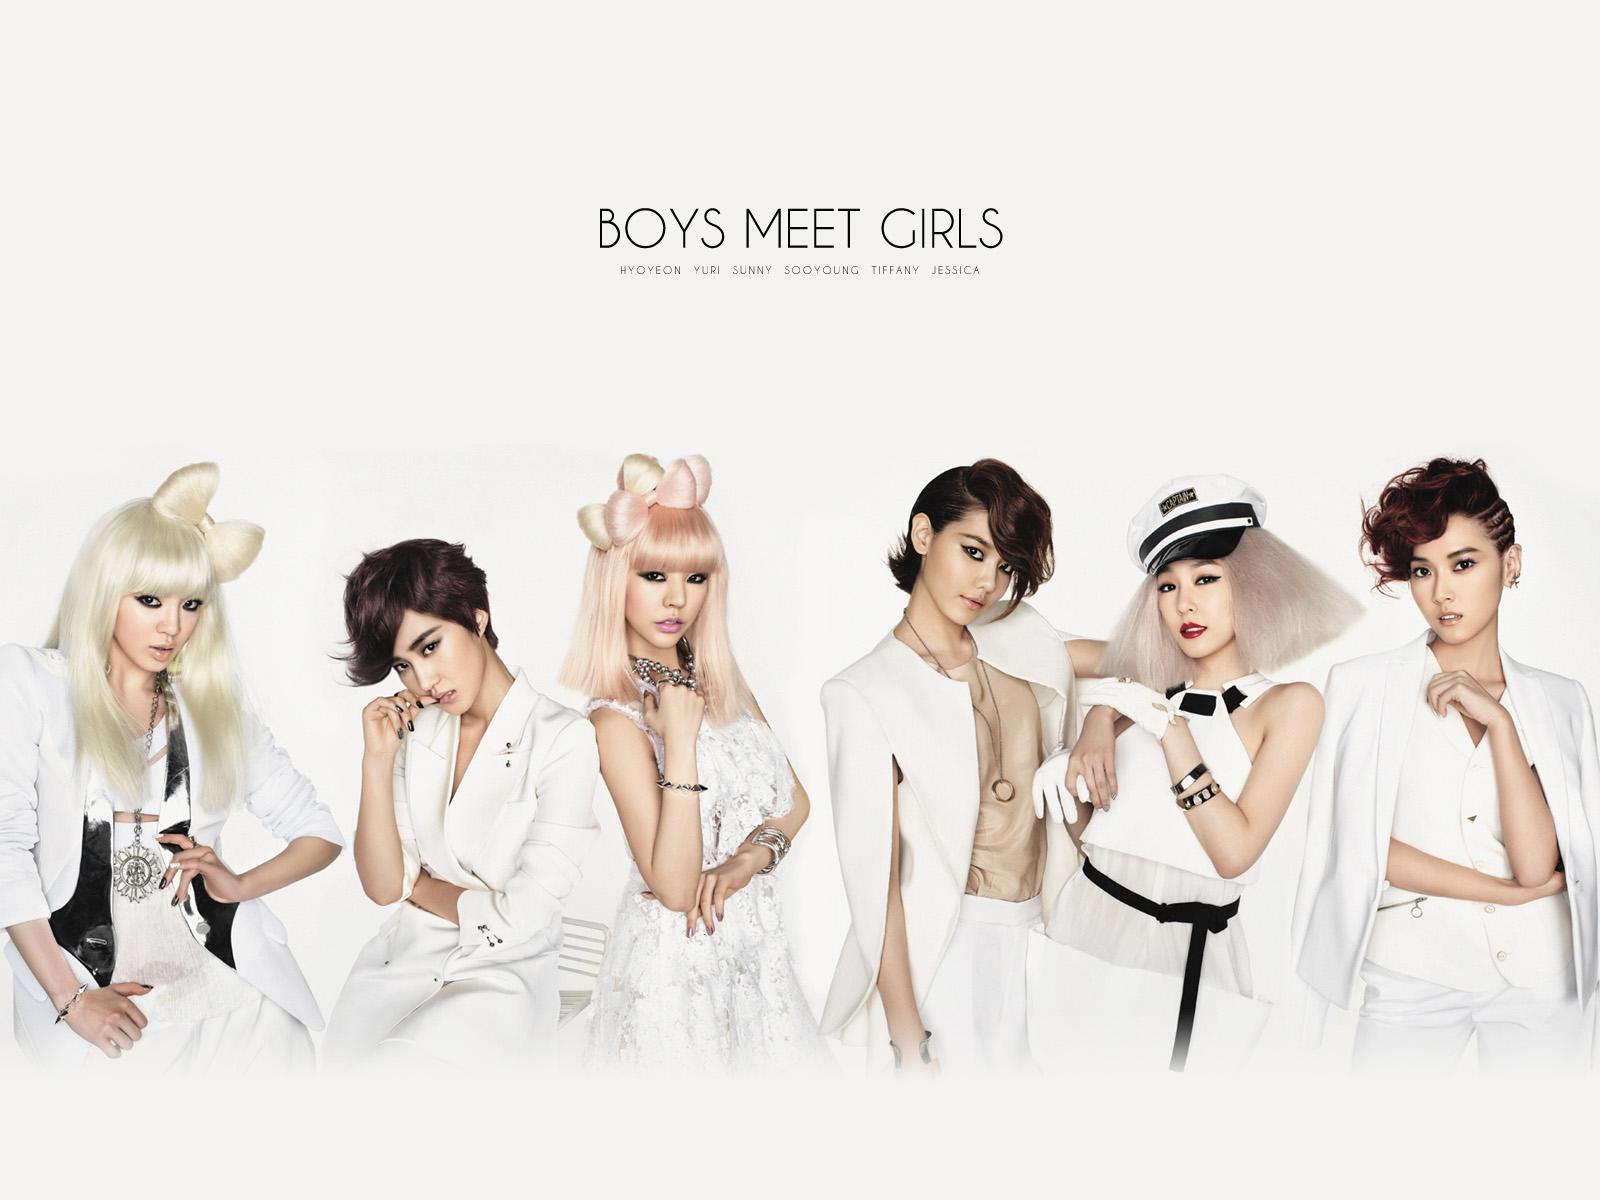 exo meet girls generation Sm entertainment boa, exo, exo-k, exo-m, shinee, tvxq, super junior, girls generation, f(x).